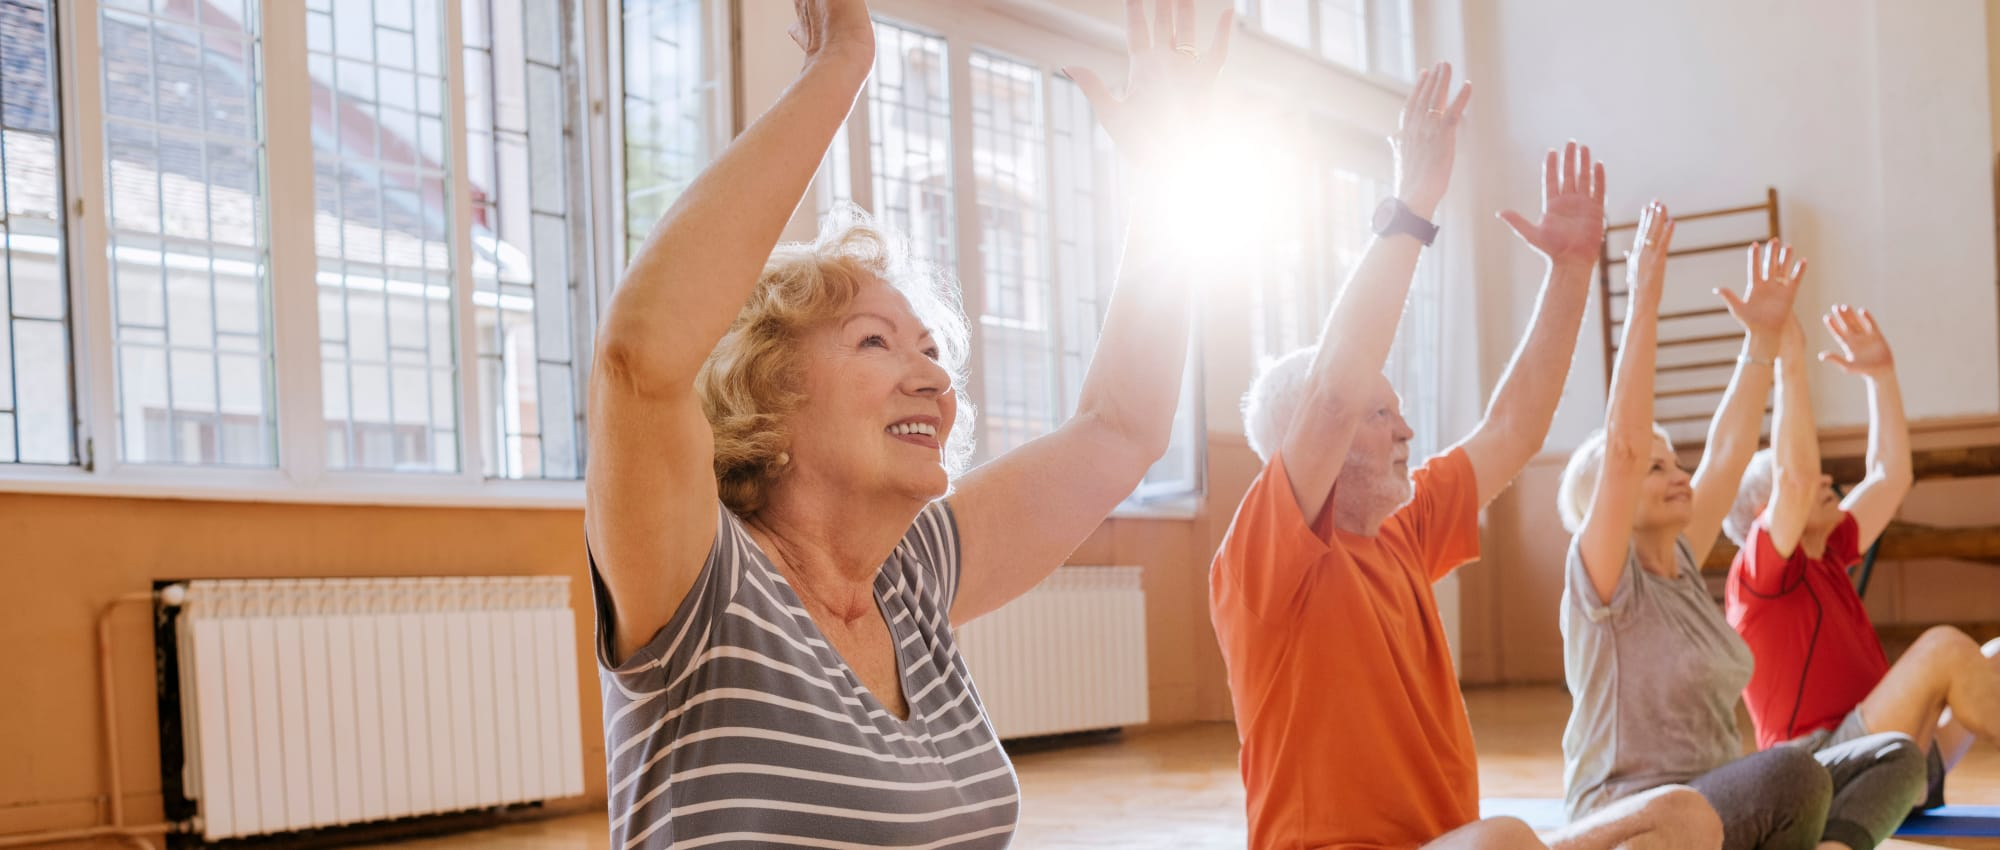 Our programs at Milestone Senior Living Tomahawk in Tomahawk, Wisconsin.